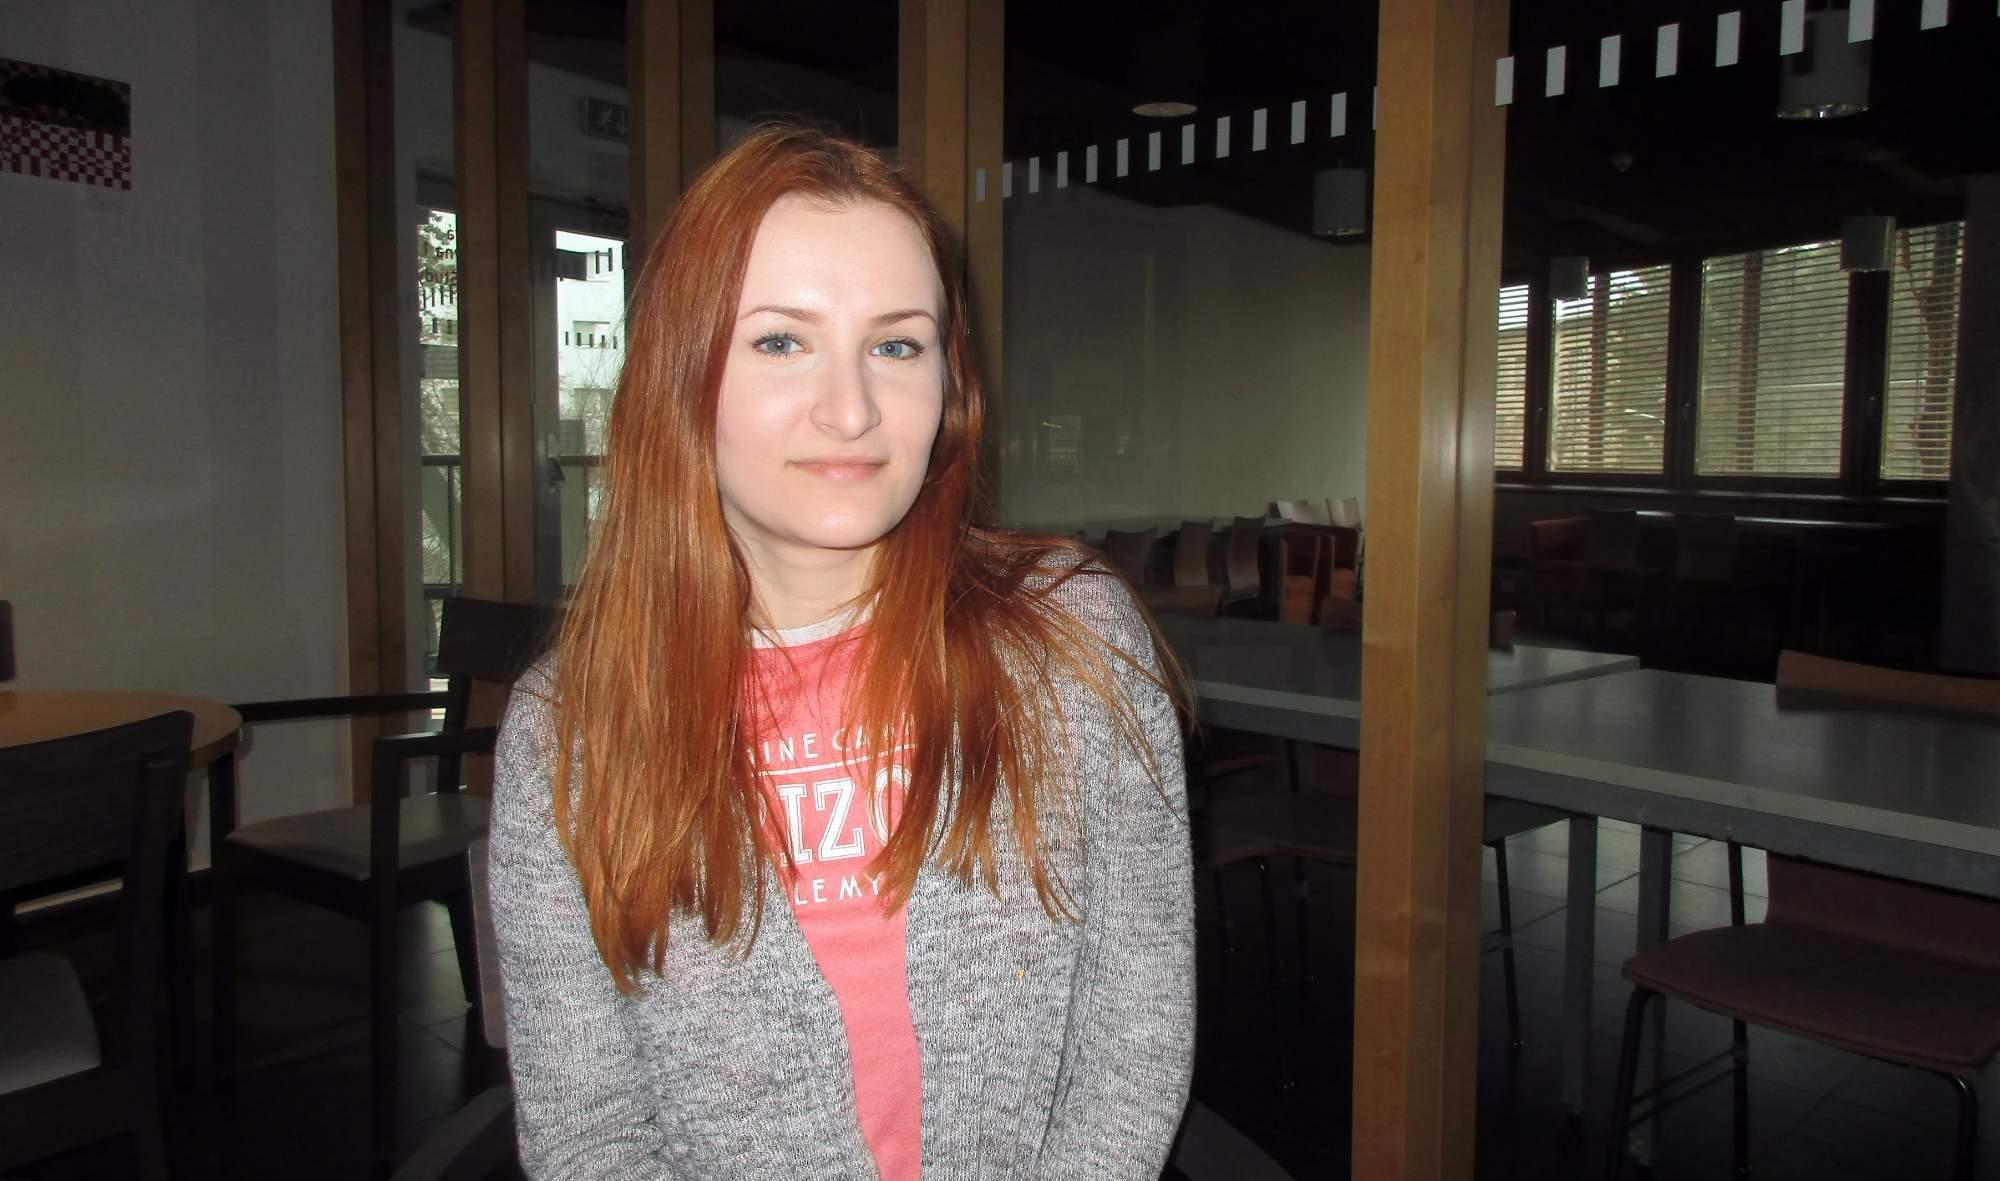 Studentka Nikola Nemjóová. Foto: Dominika Sladká